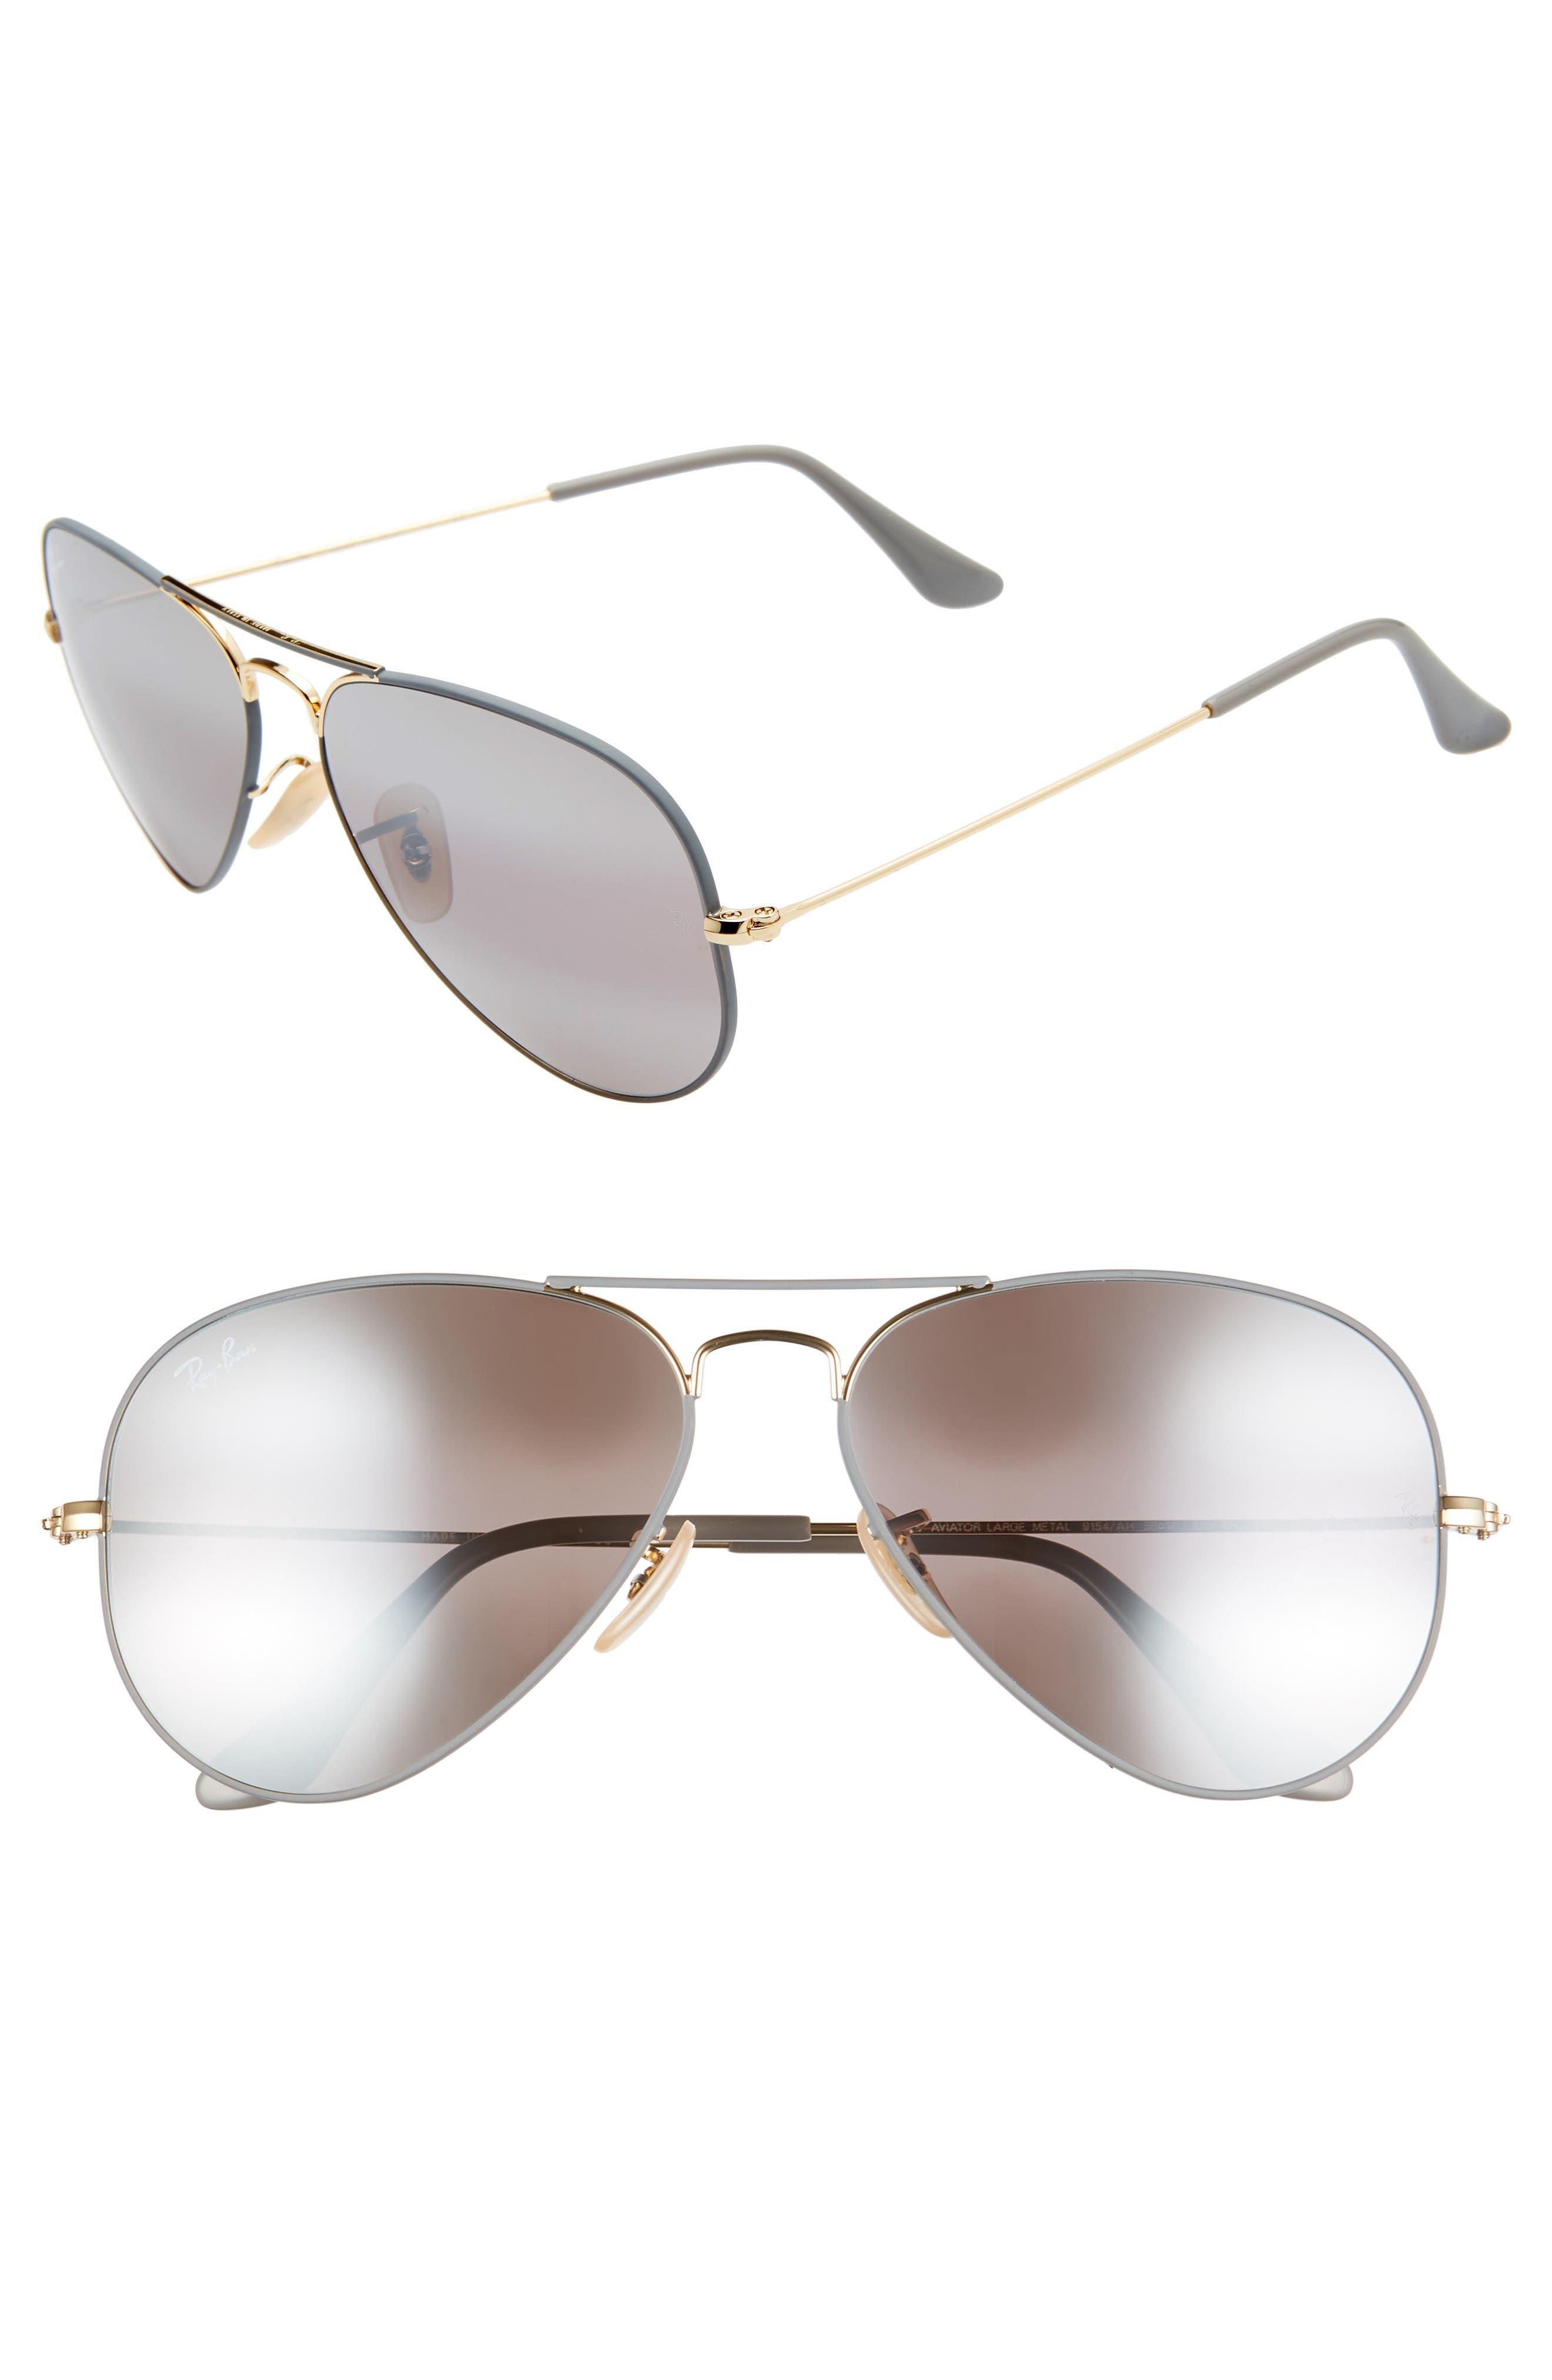 RAY-BAN Standard Original 58mm Aviator Sunglasses, Main, color, GREY/ GOLD MIRROR